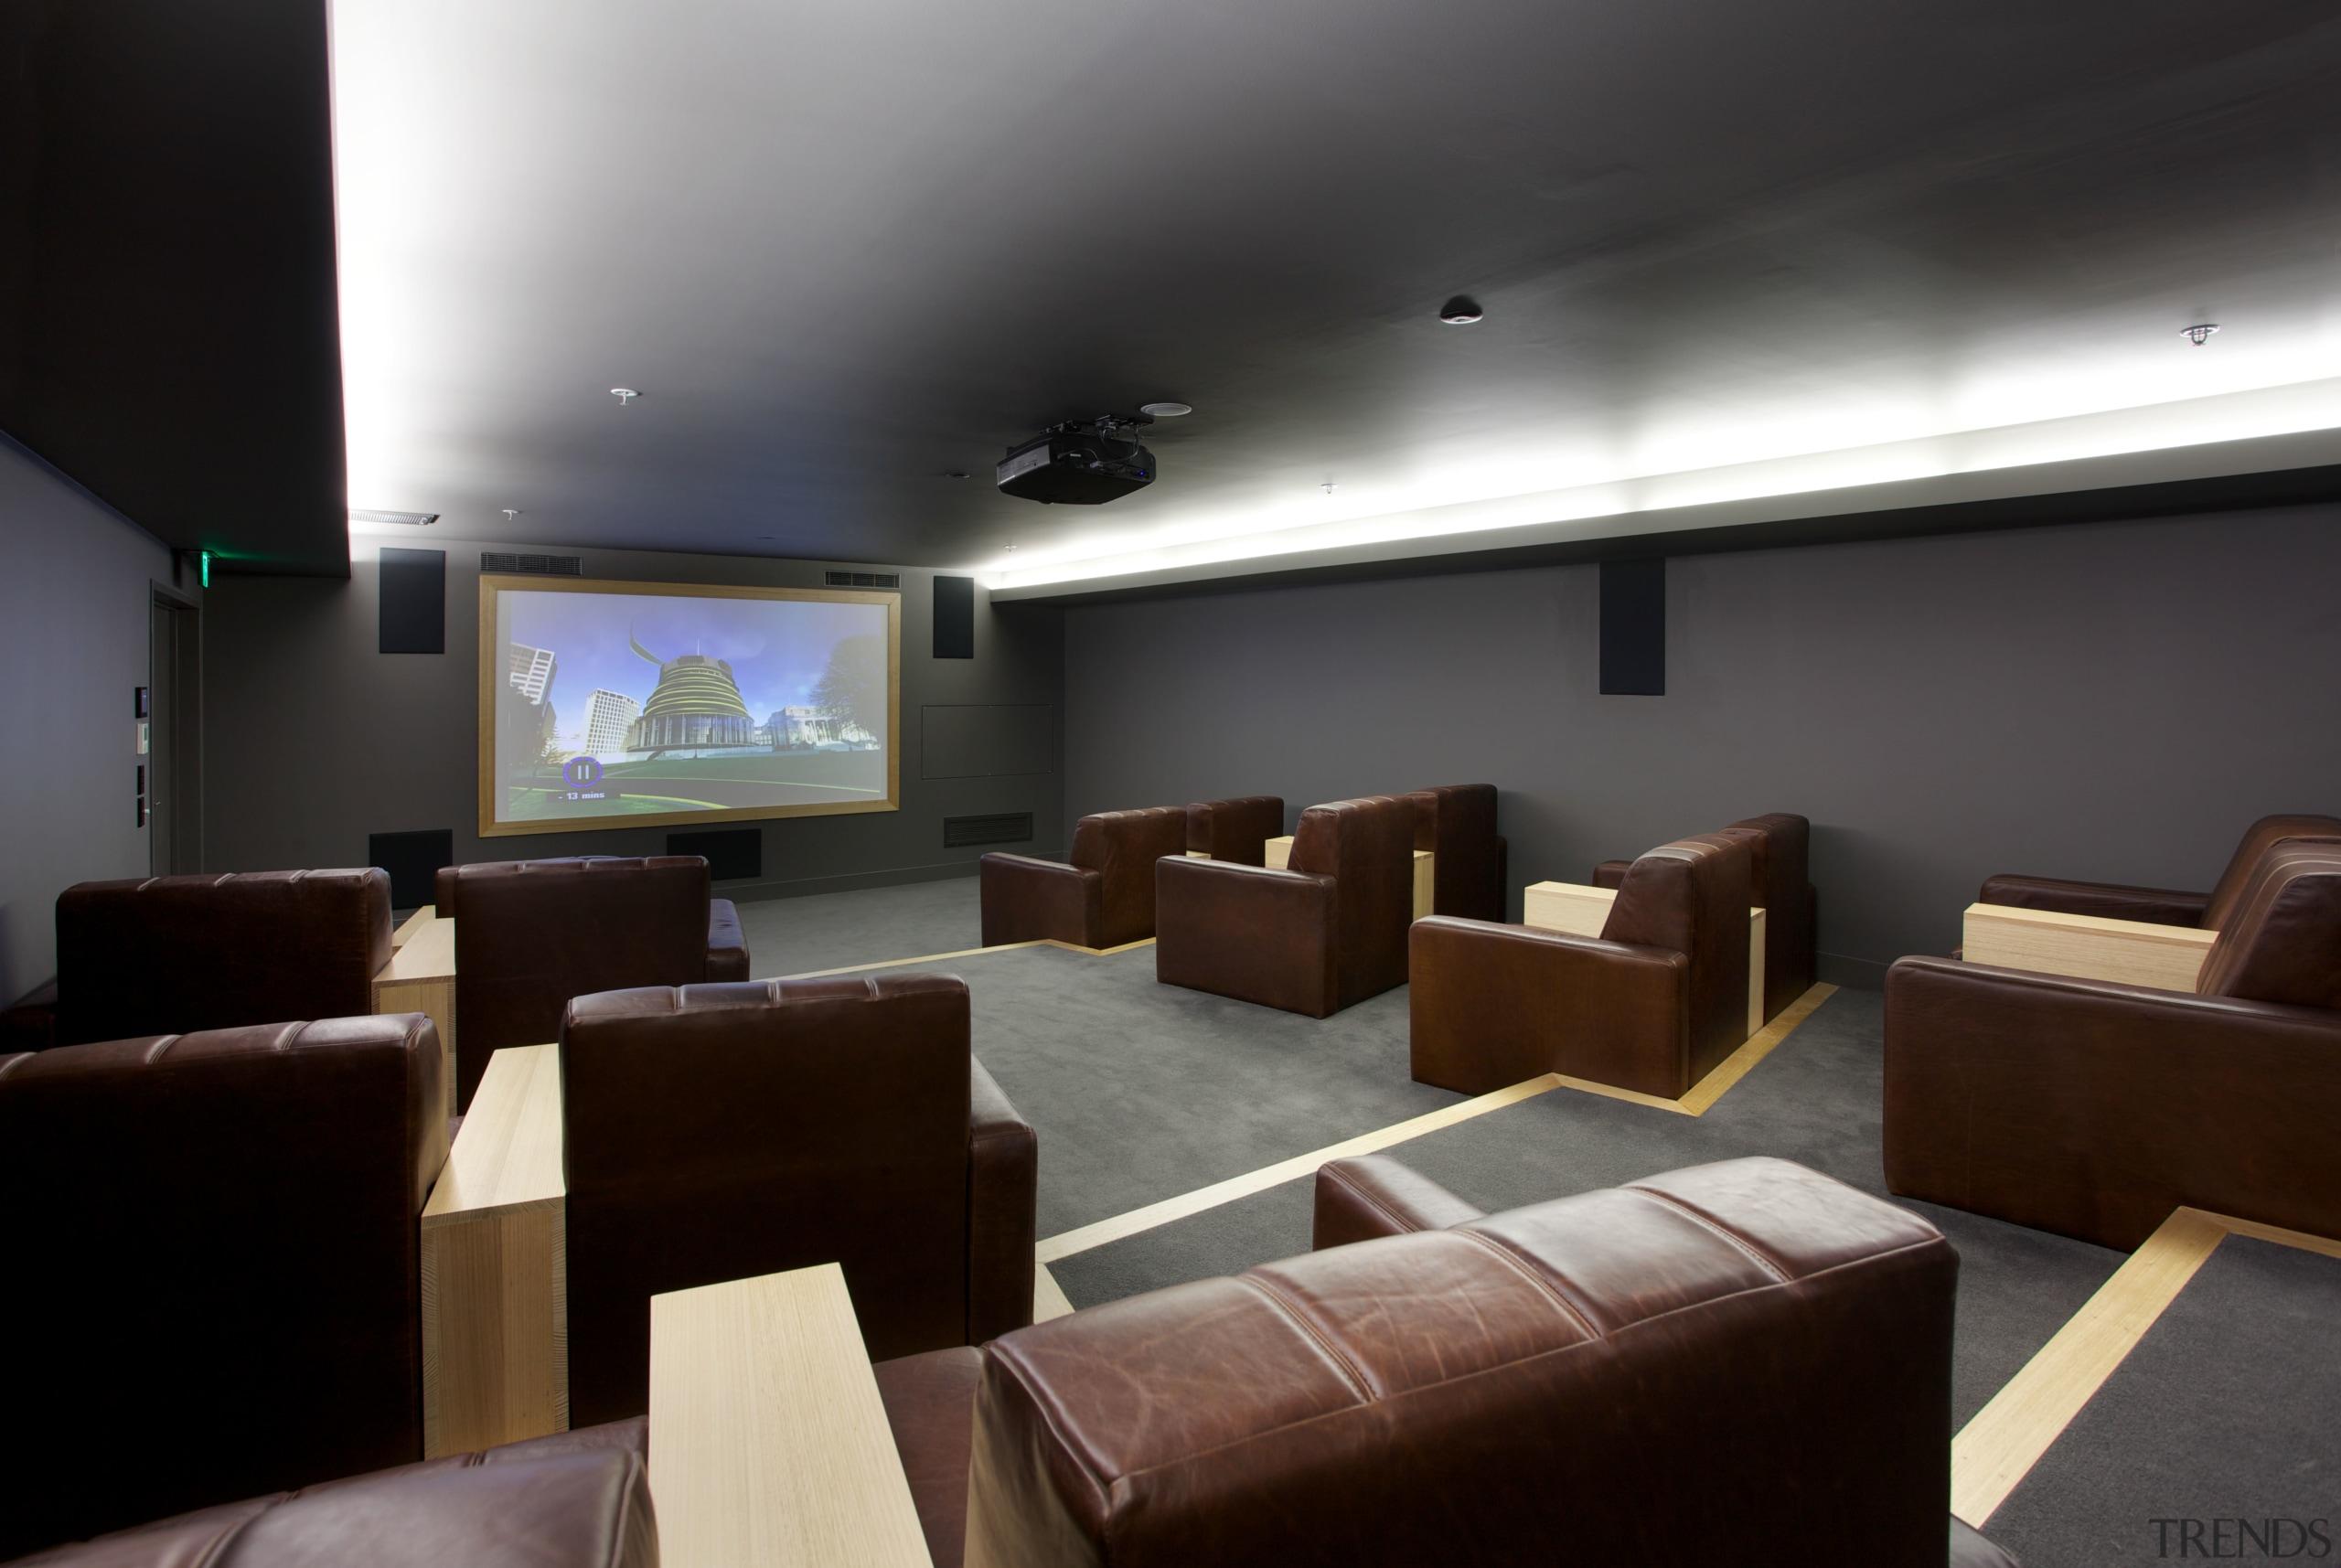 The Clyde Quay Wharf apartment development includes a auditorium, ceiling, conference hall, interior design, black